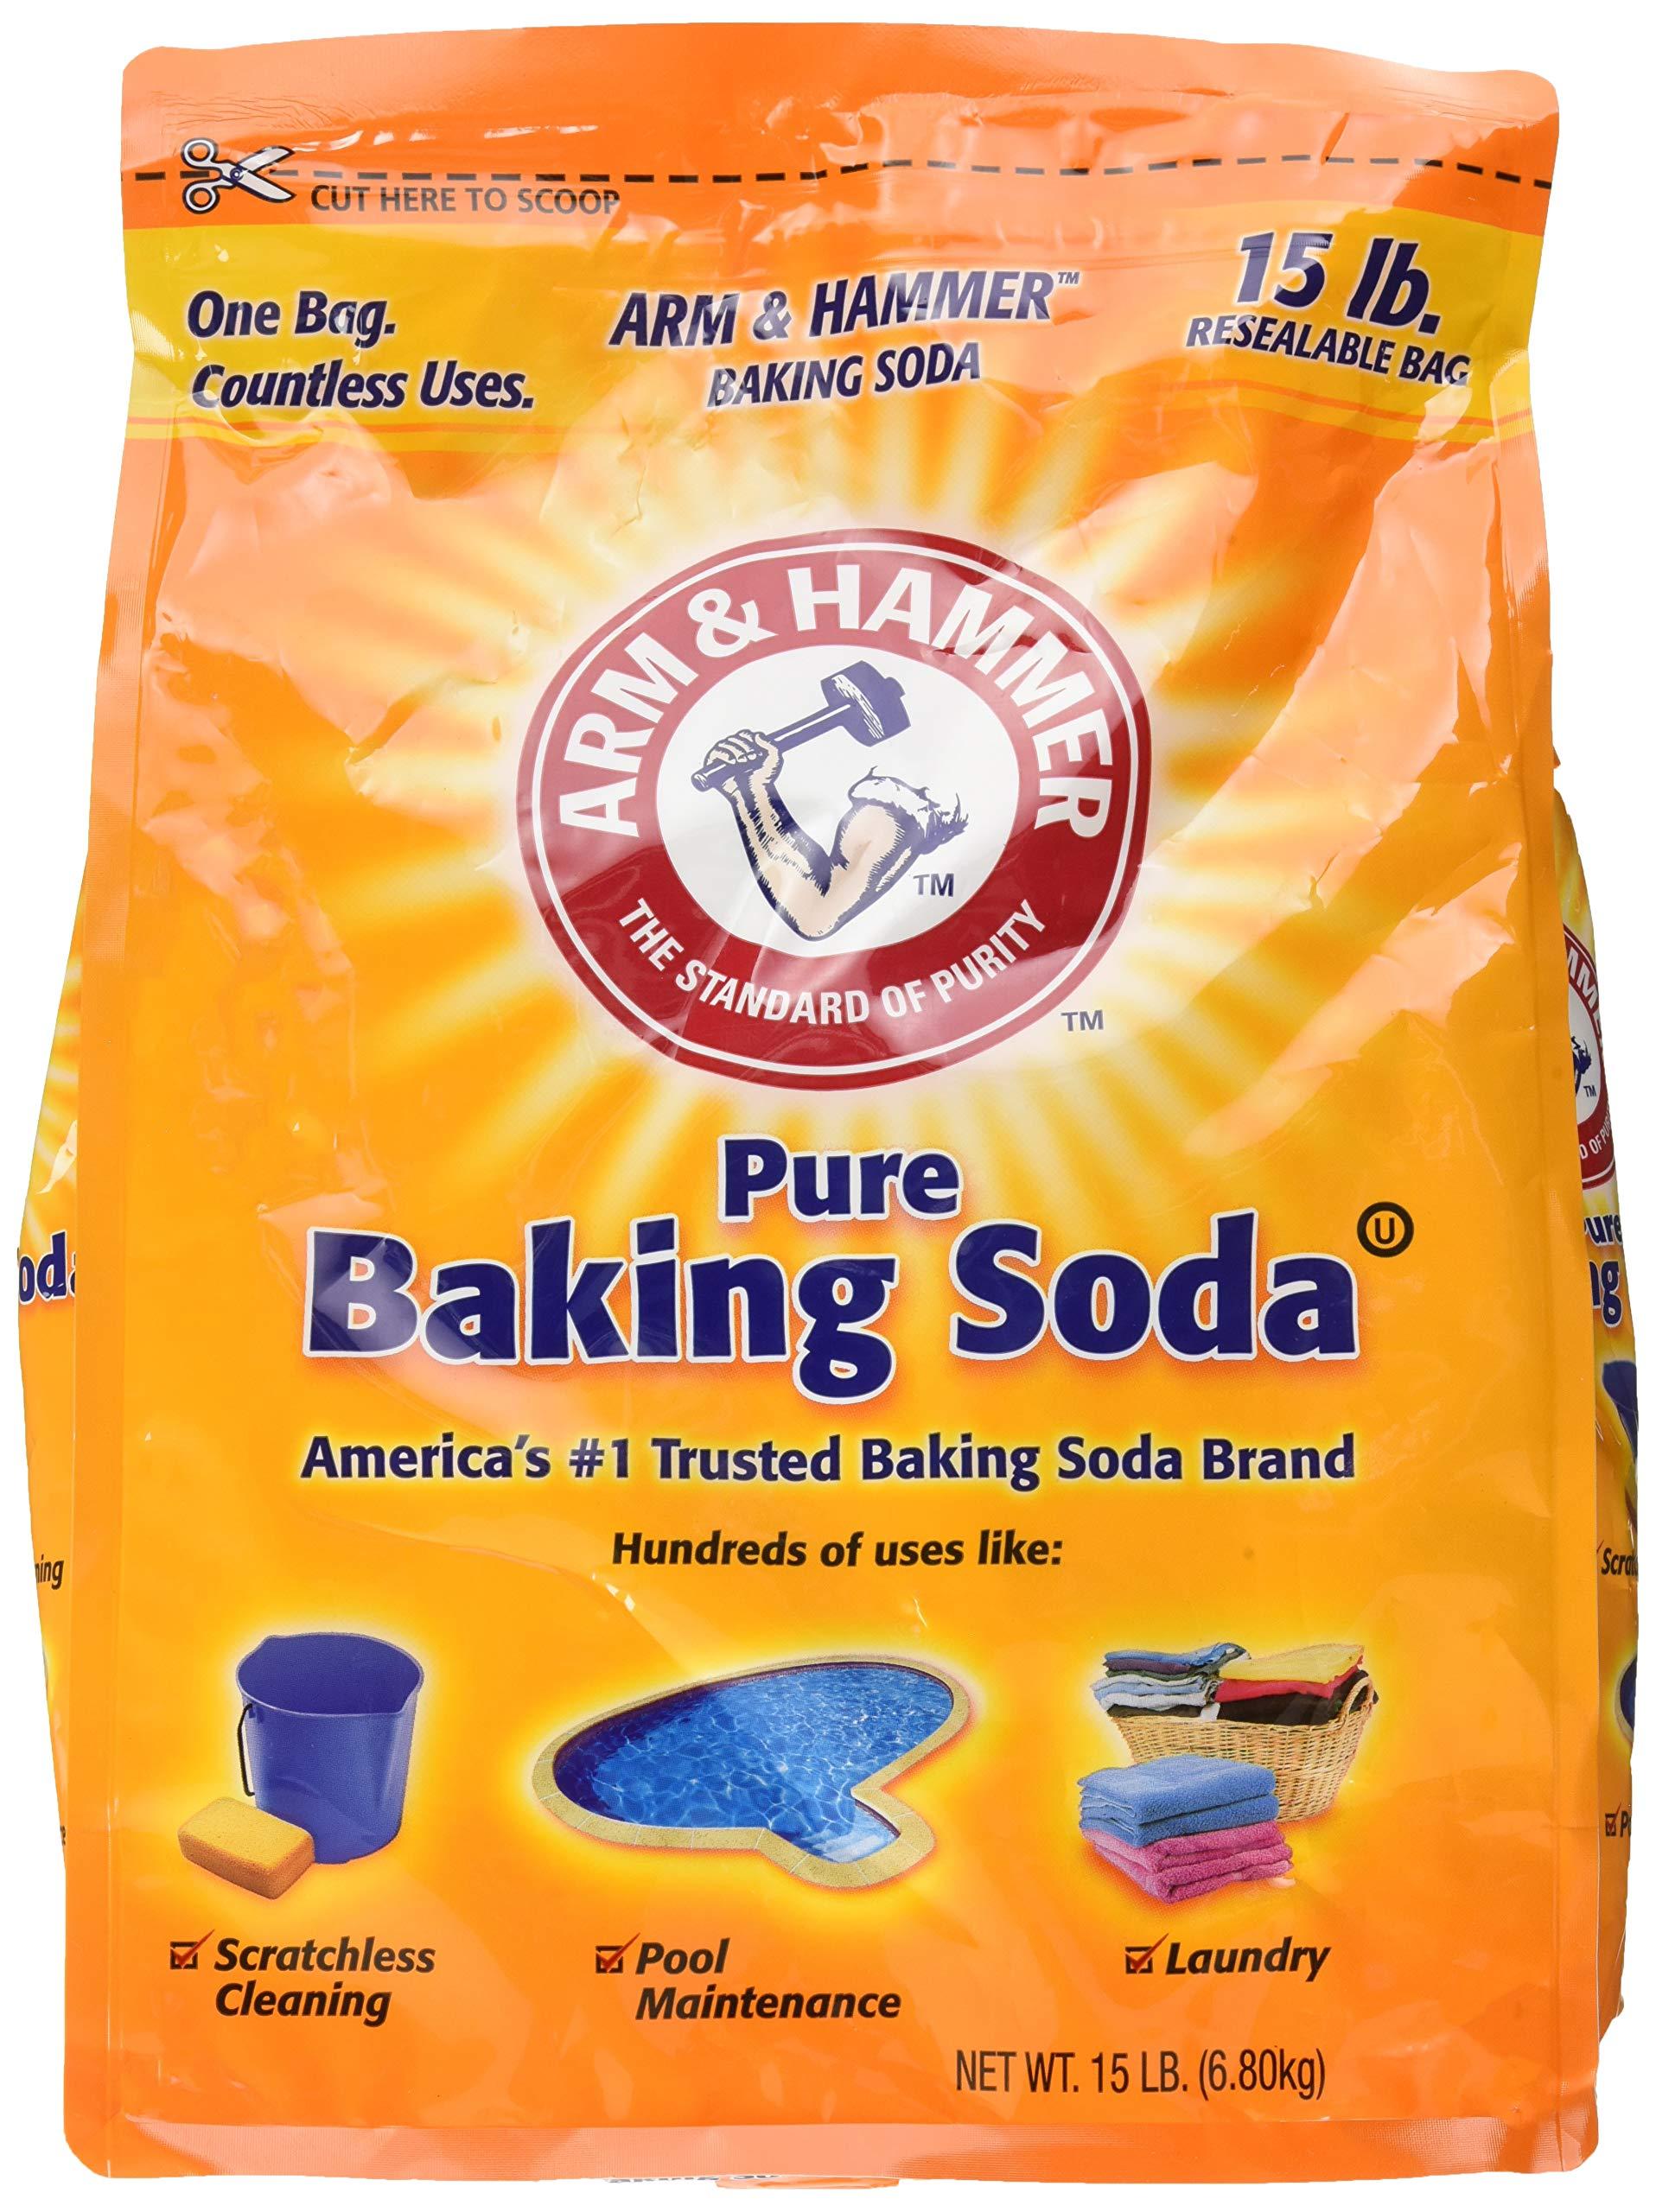 ARM & HAMMER Baking Soda, 13.5 Pound by Arm & Hammer